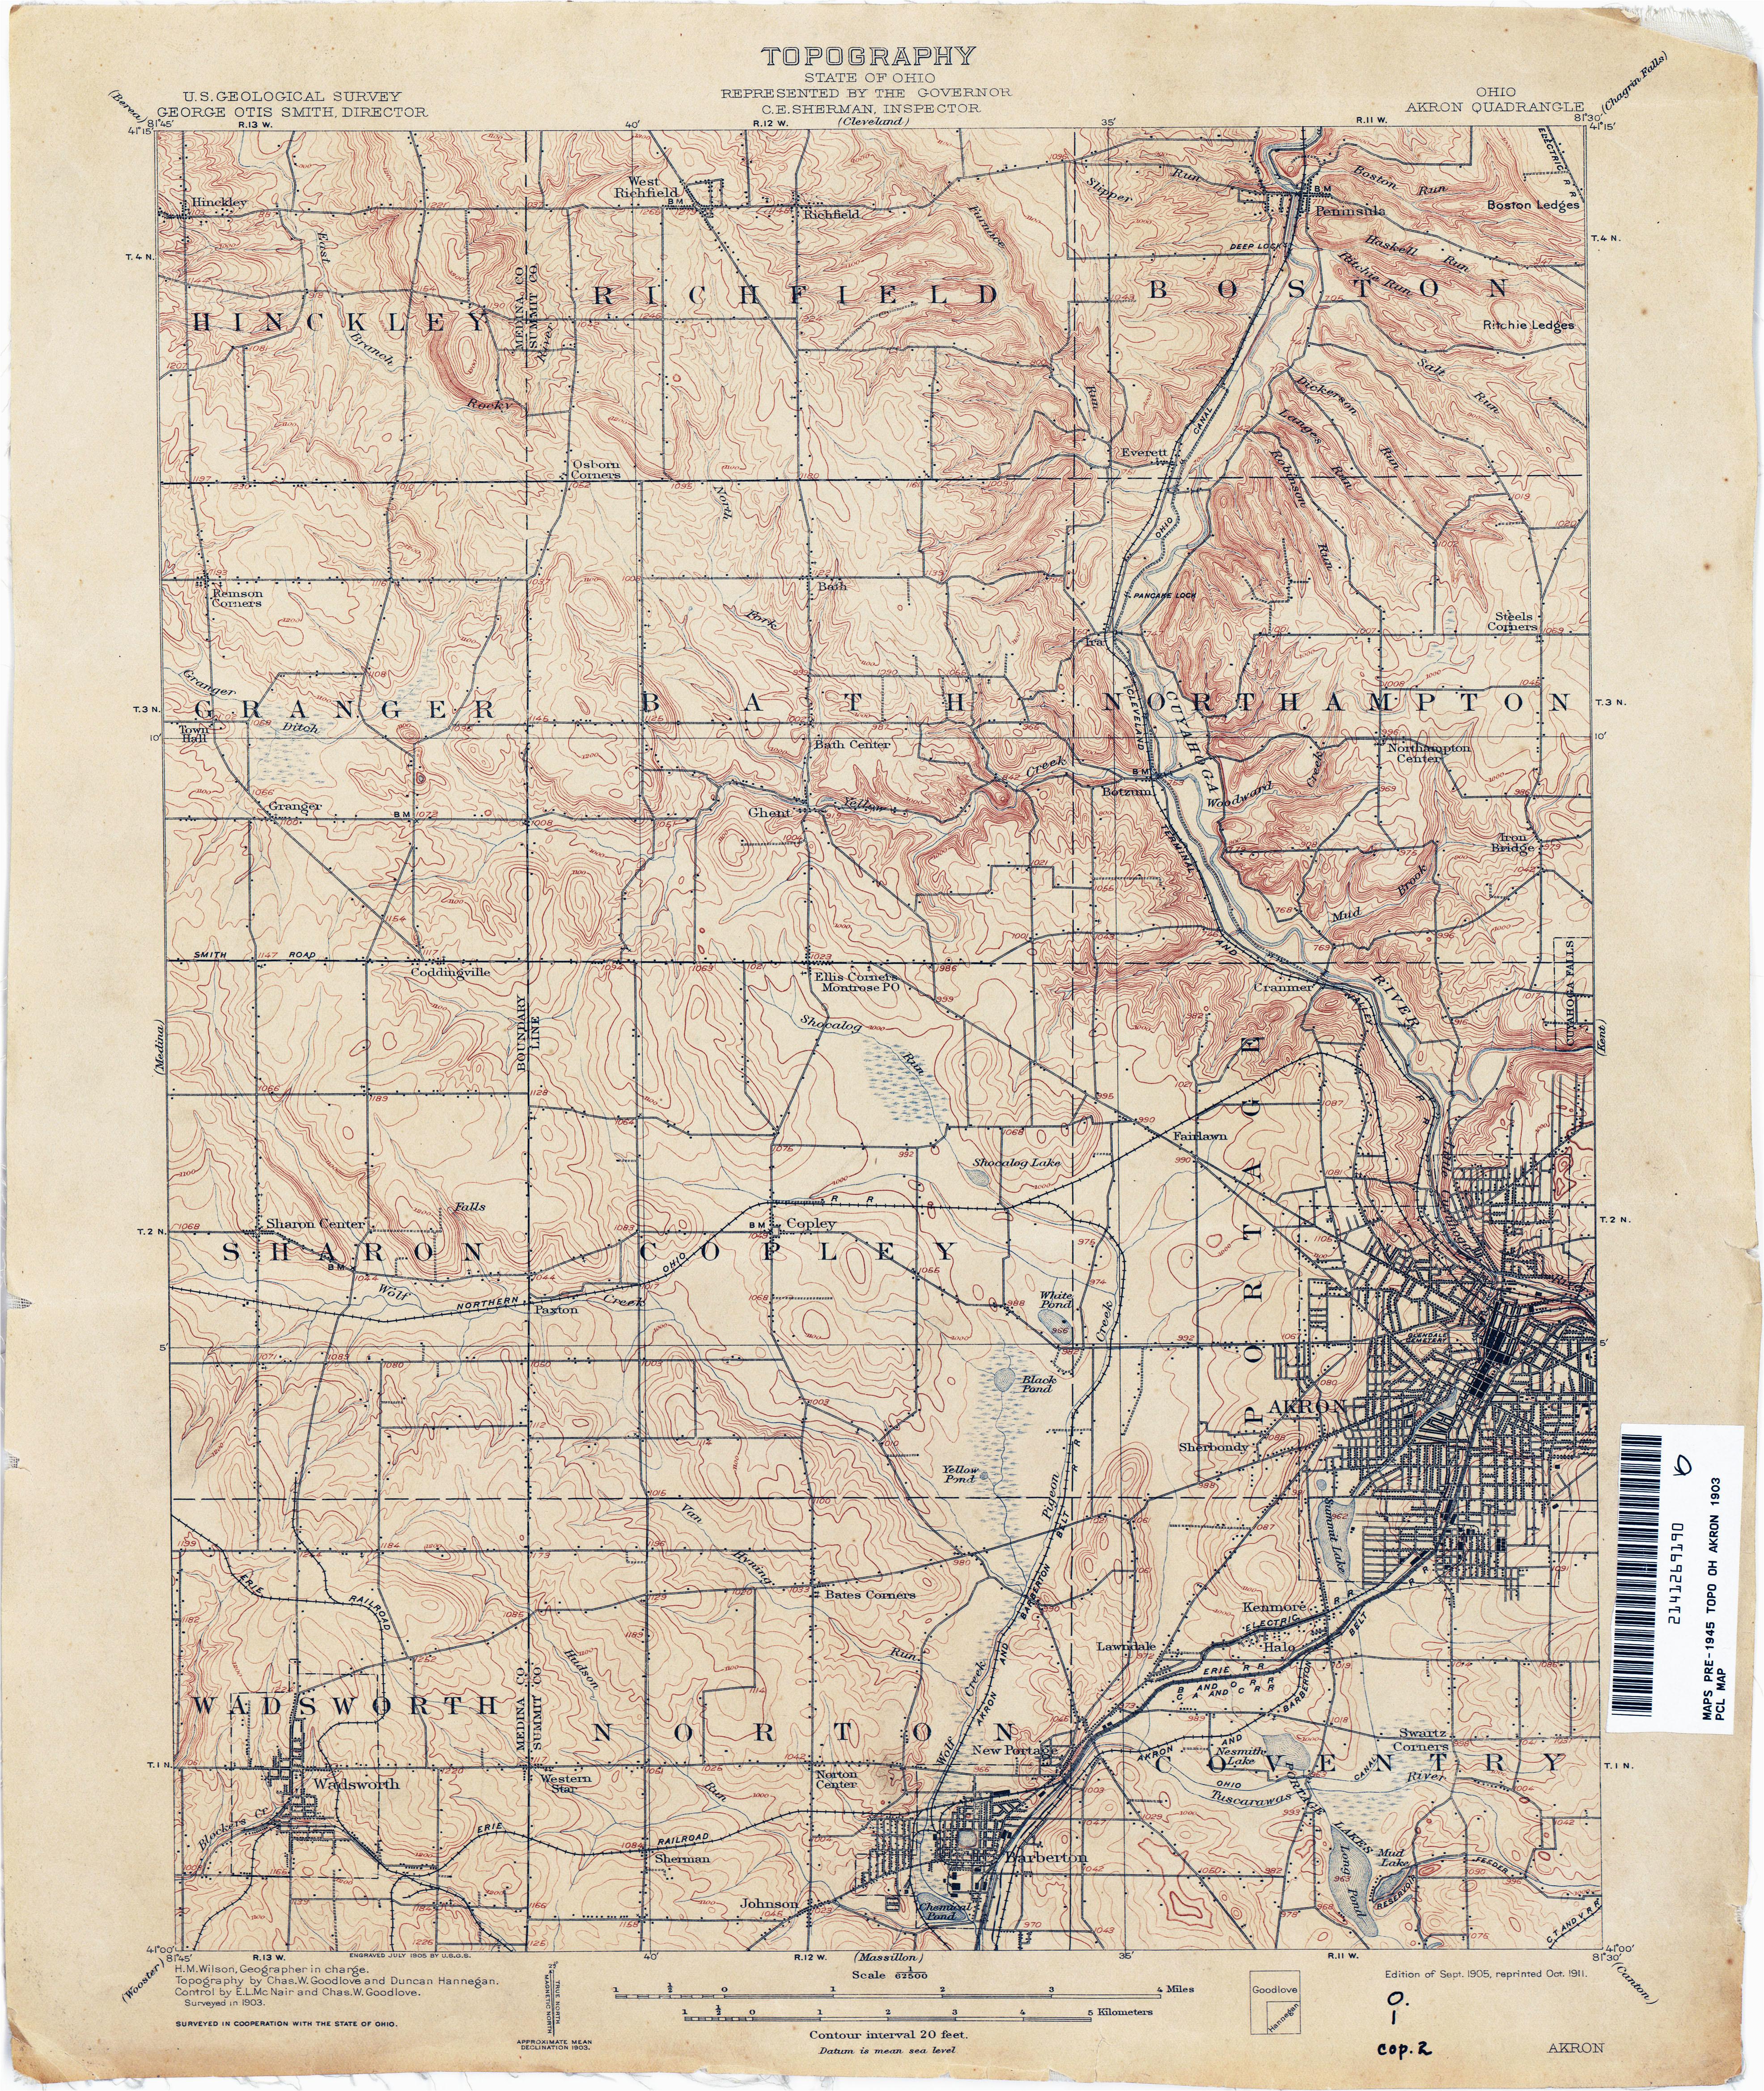 Licking County Ohio 1901 Map Newark Oh